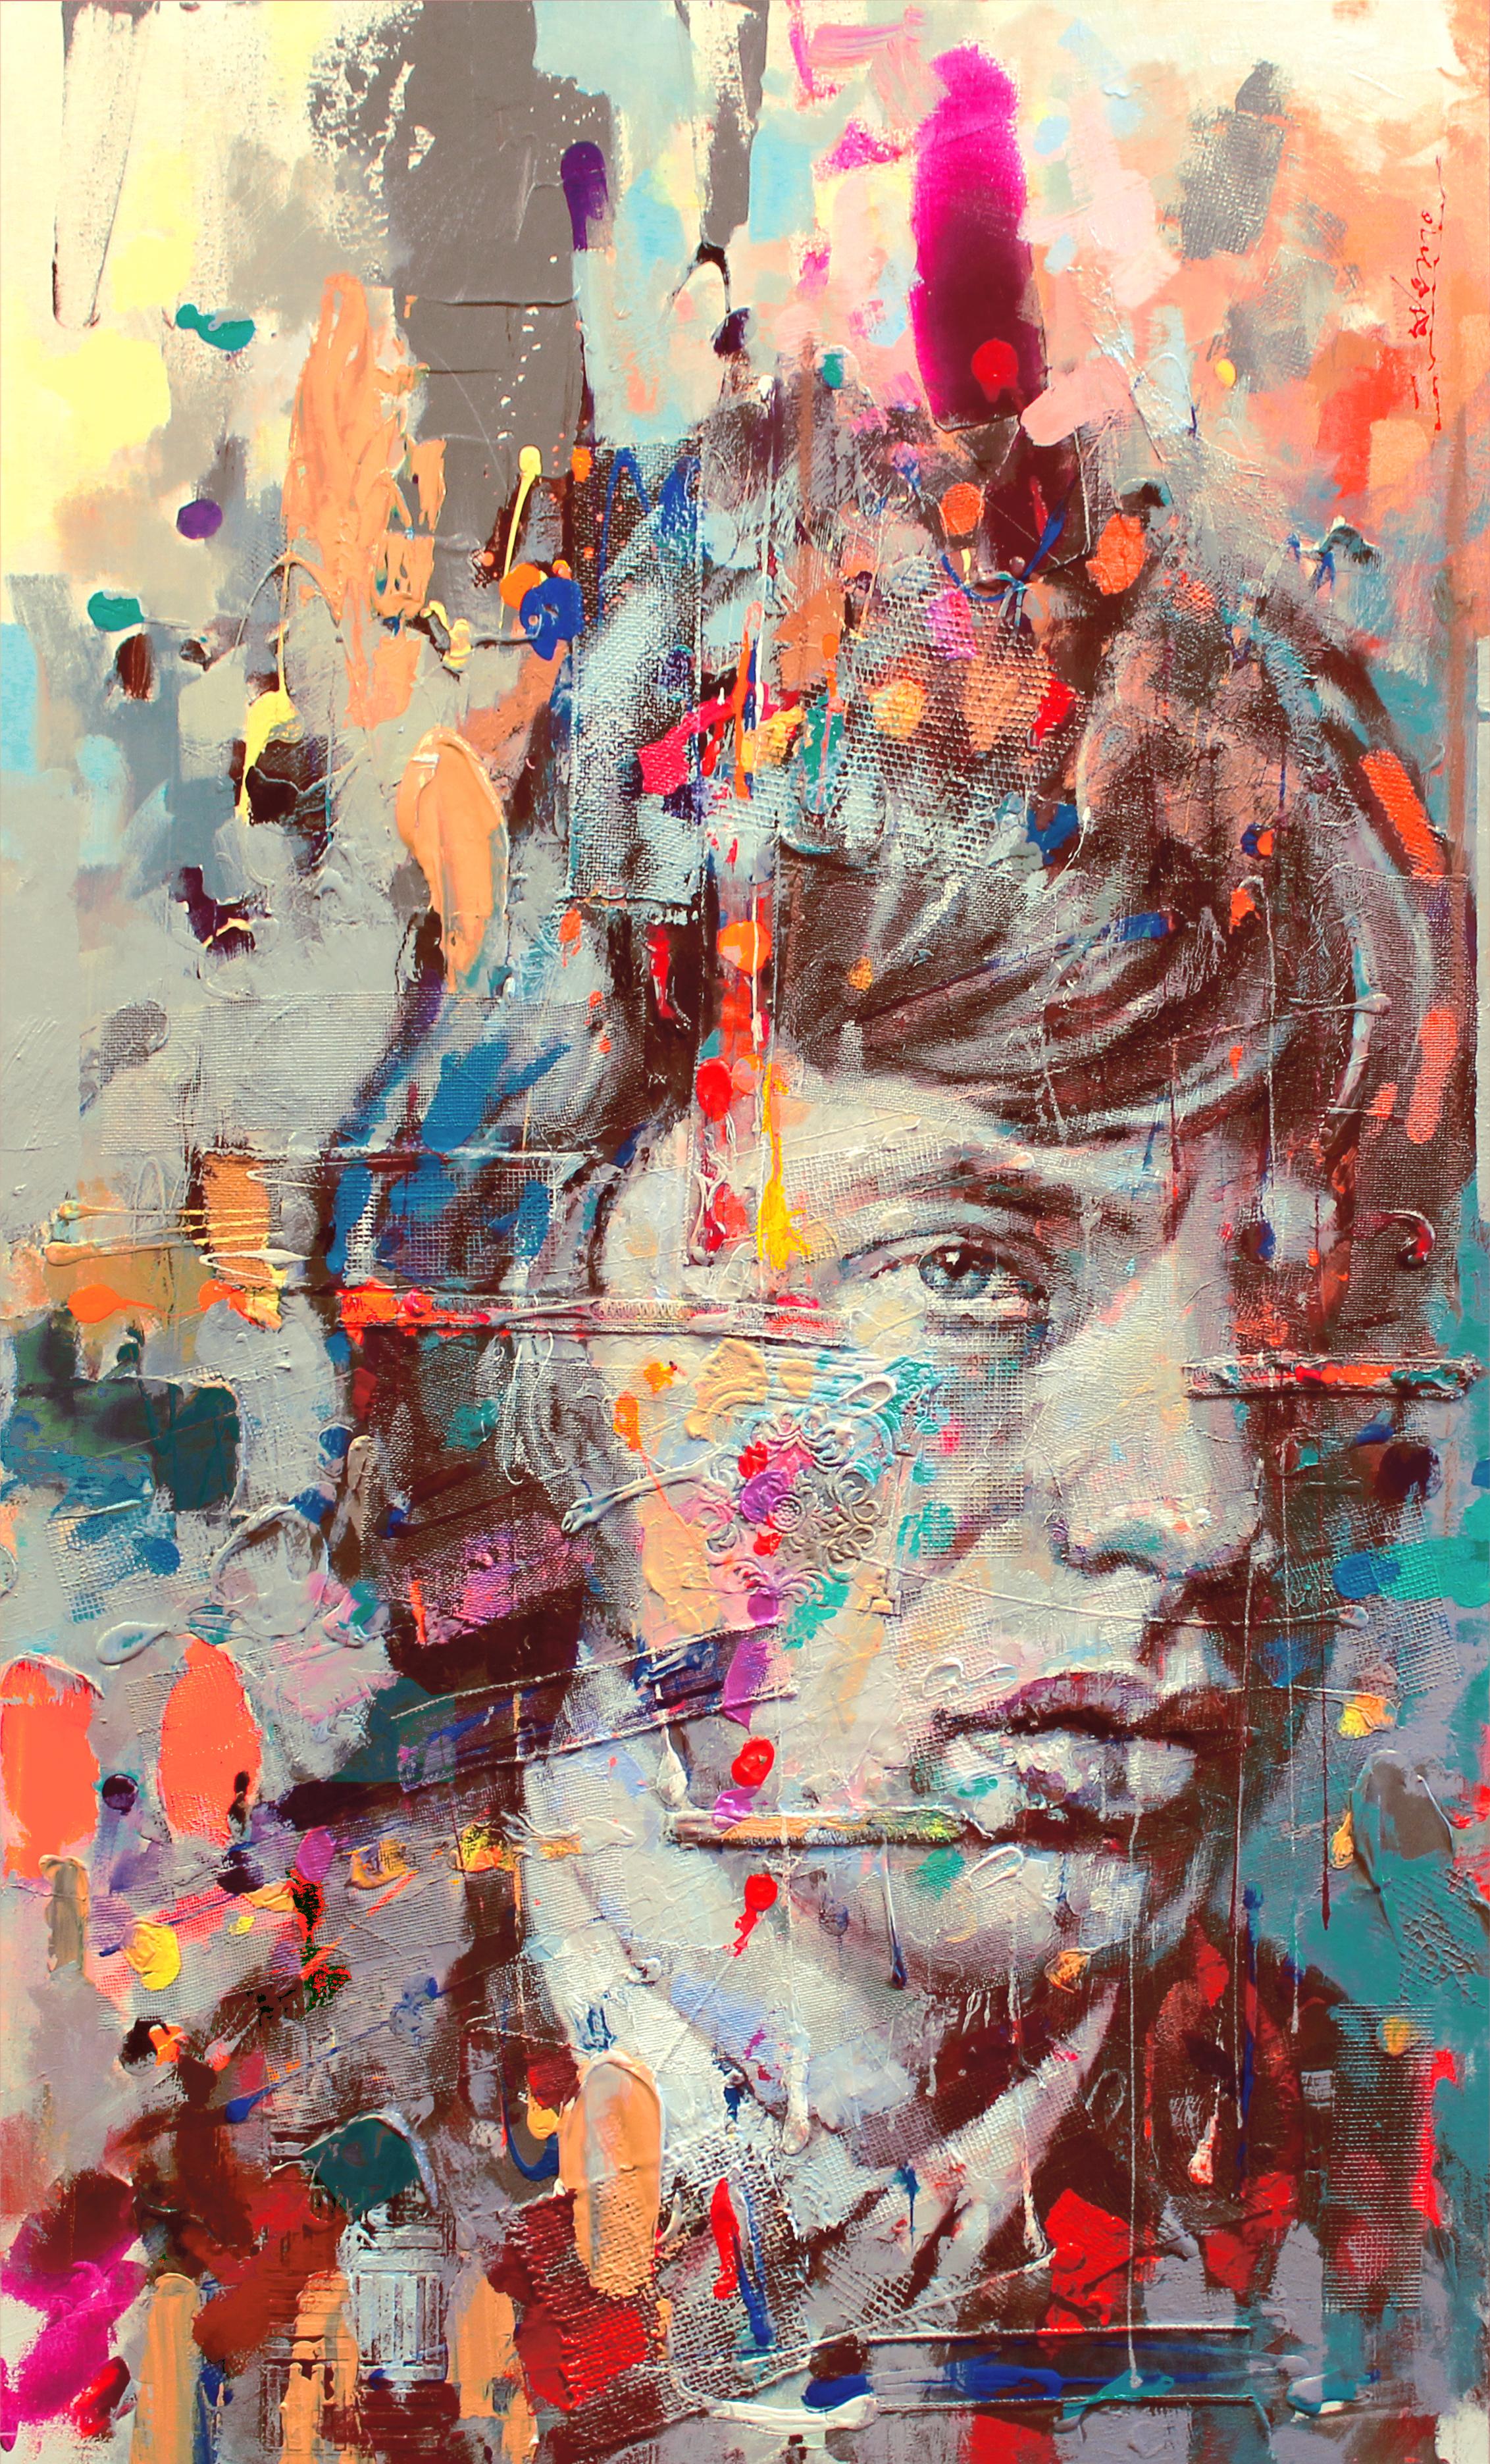 M. Jagger